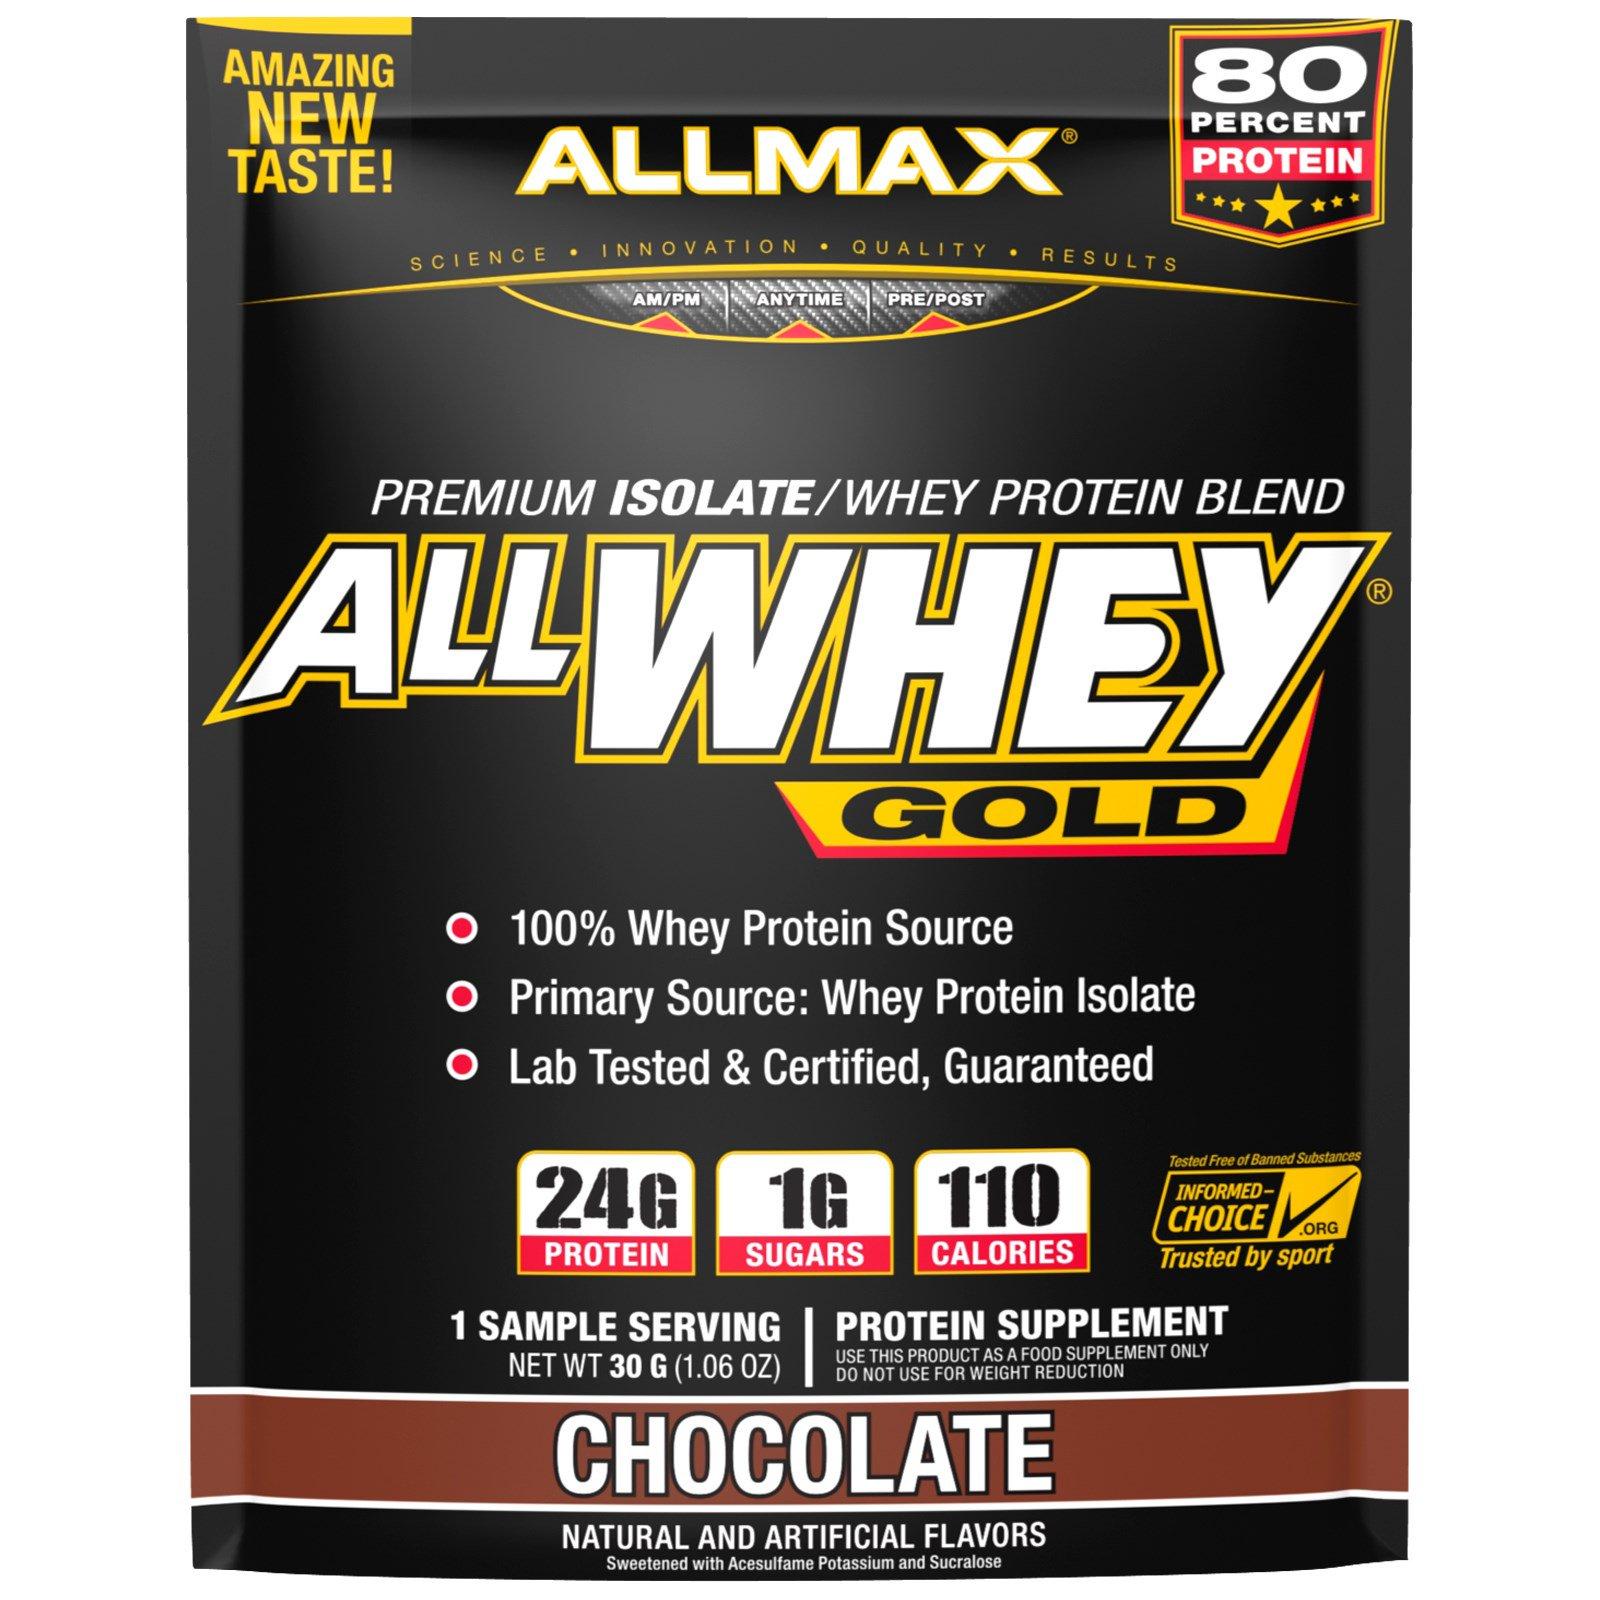 ALLMAX Nutrition, AllWhey Gold, 100% Whey Protein + Premium Whey Protein Isolate, Chocolate